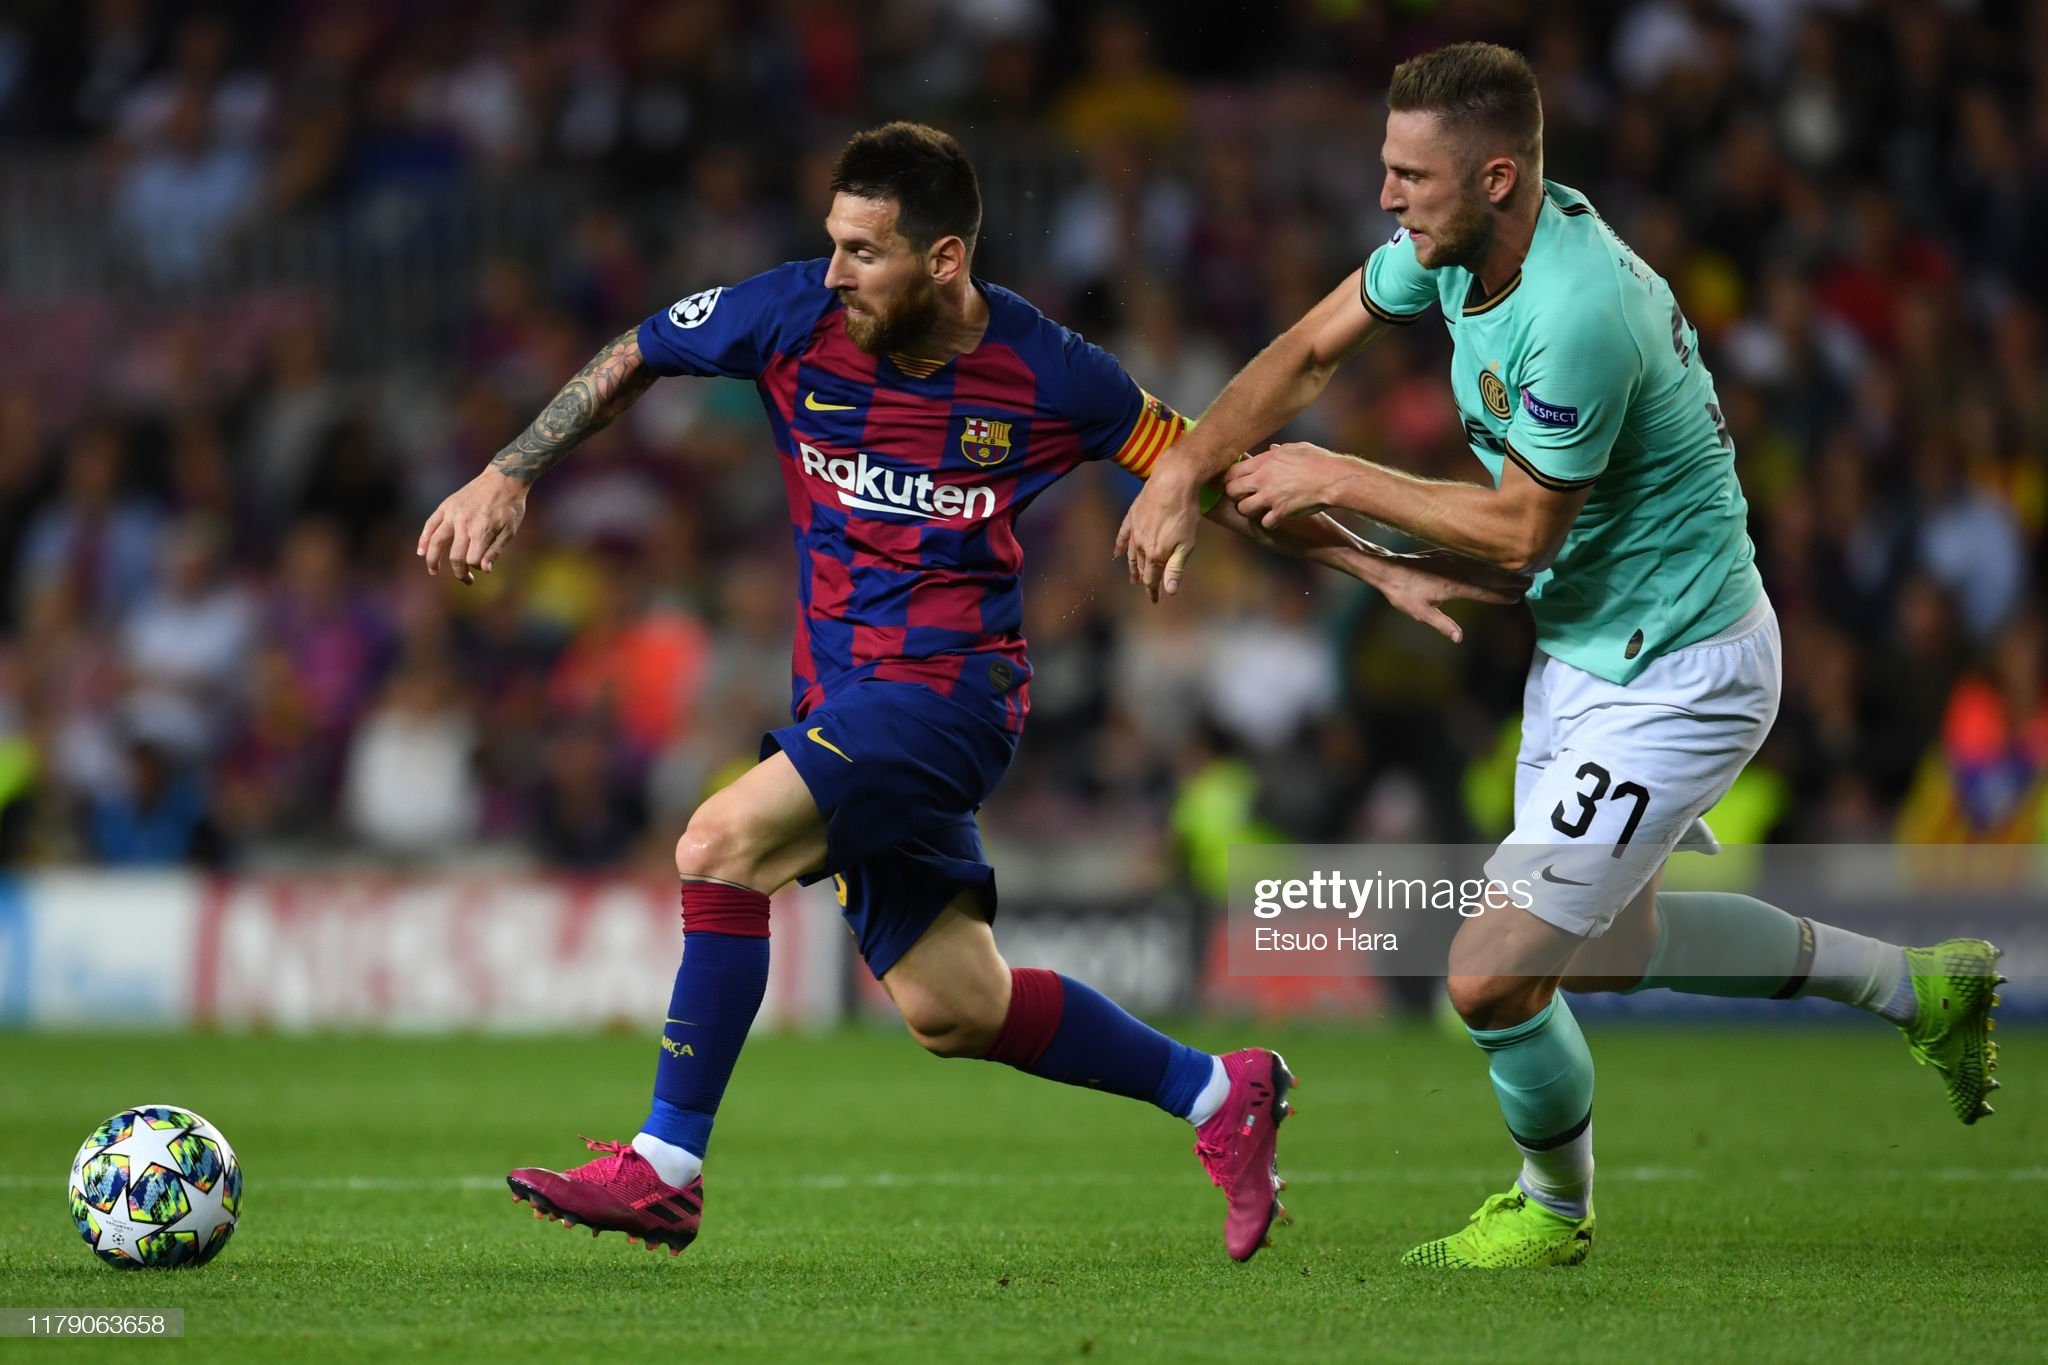 صور مباراة : برشلونة - إنتر 2-1 ( 02-10-2019 )  Lionel-messi-of-fc-barcelona-and-milan-skriniar-of-inter-compete-for-picture-id1179063658?s=2048x2048